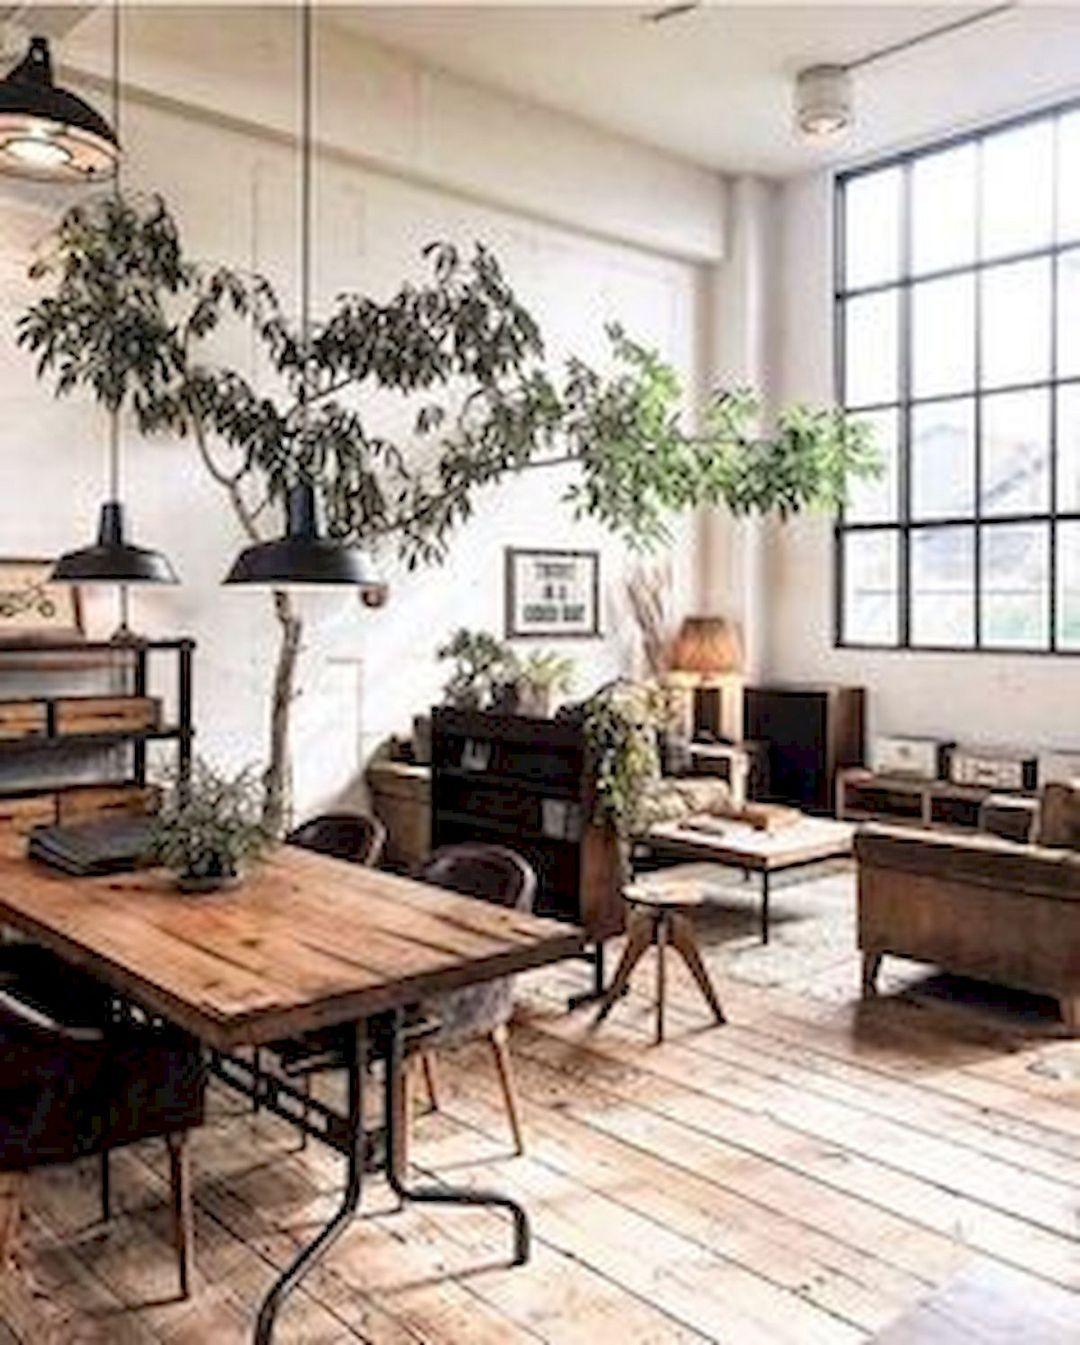 Modern Glam Living Room Decorating Ideas 19: Interior Design Ideas To Thai Style Home Wabi Sabi [4 In